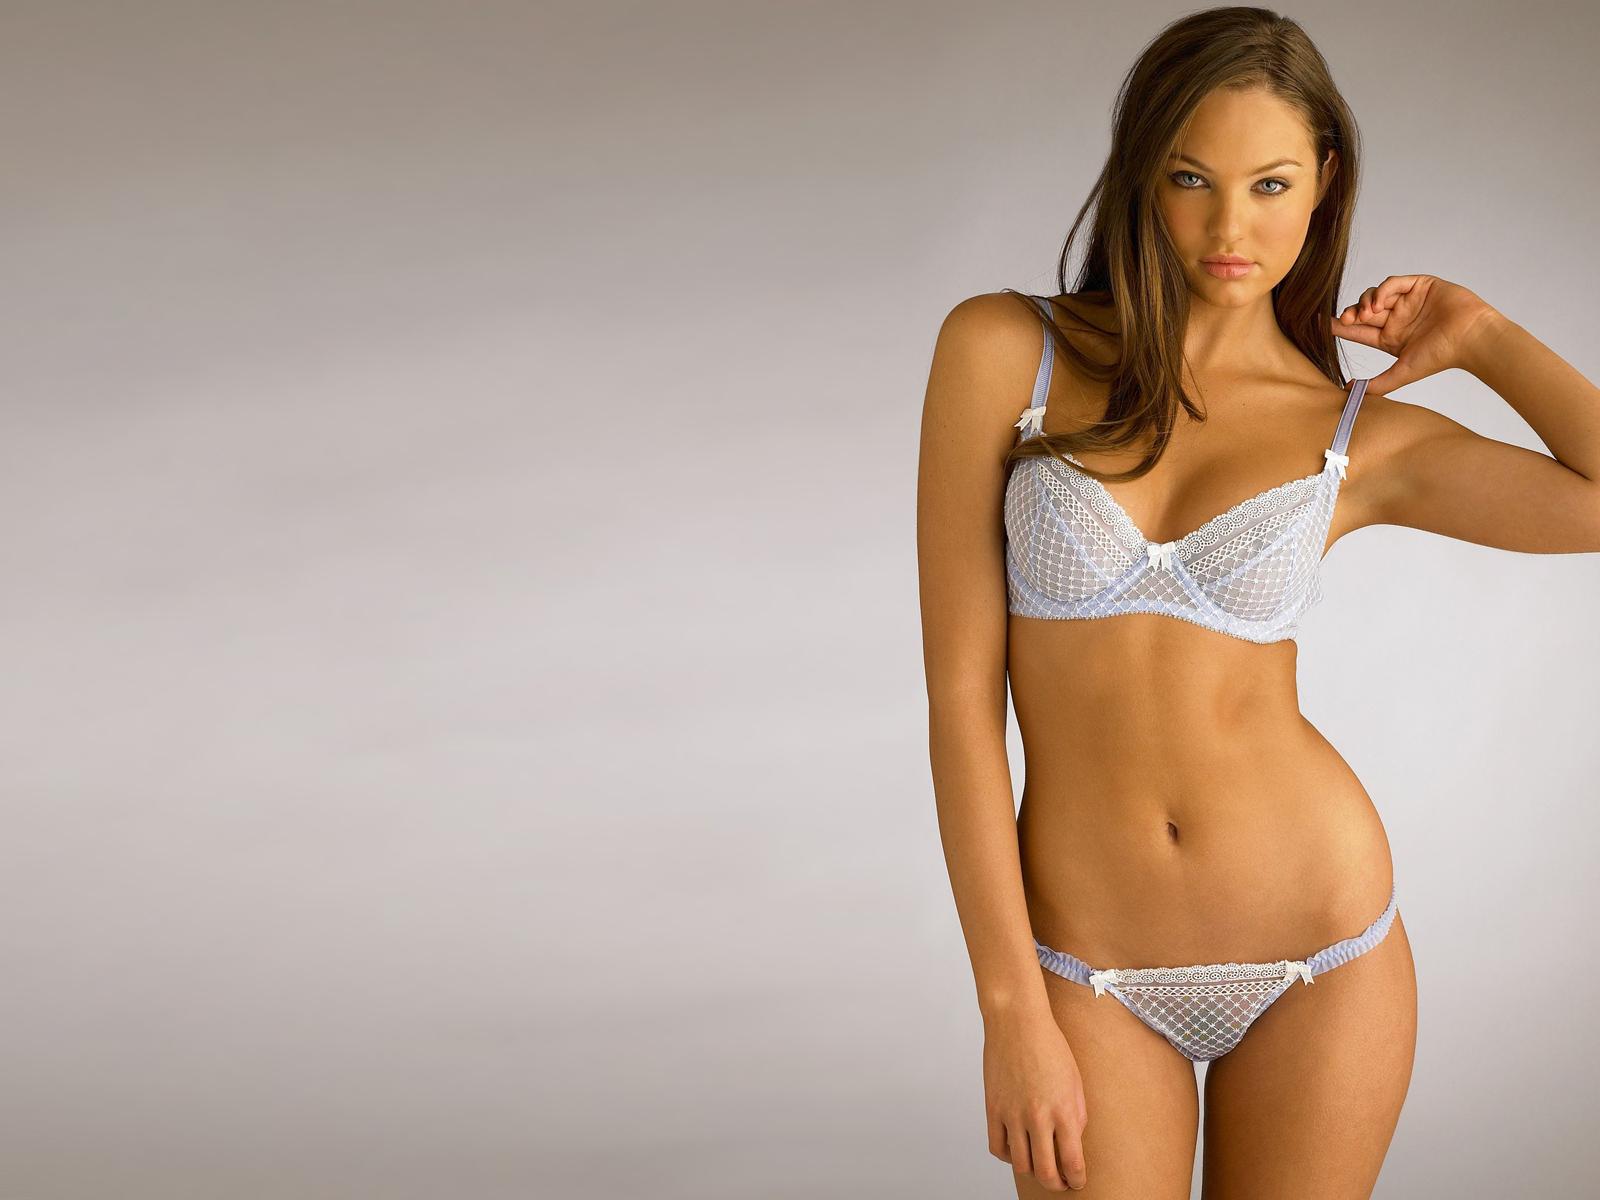 http://1.bp.blogspot.com/-pitwb2_HsE4/TeRXH7z4aUI/AAAAAAAAAOc/9xPeuOf3WTM/s1600/bikini%2Bhot%2Bgirls%2Bwallpapers-02.jpg